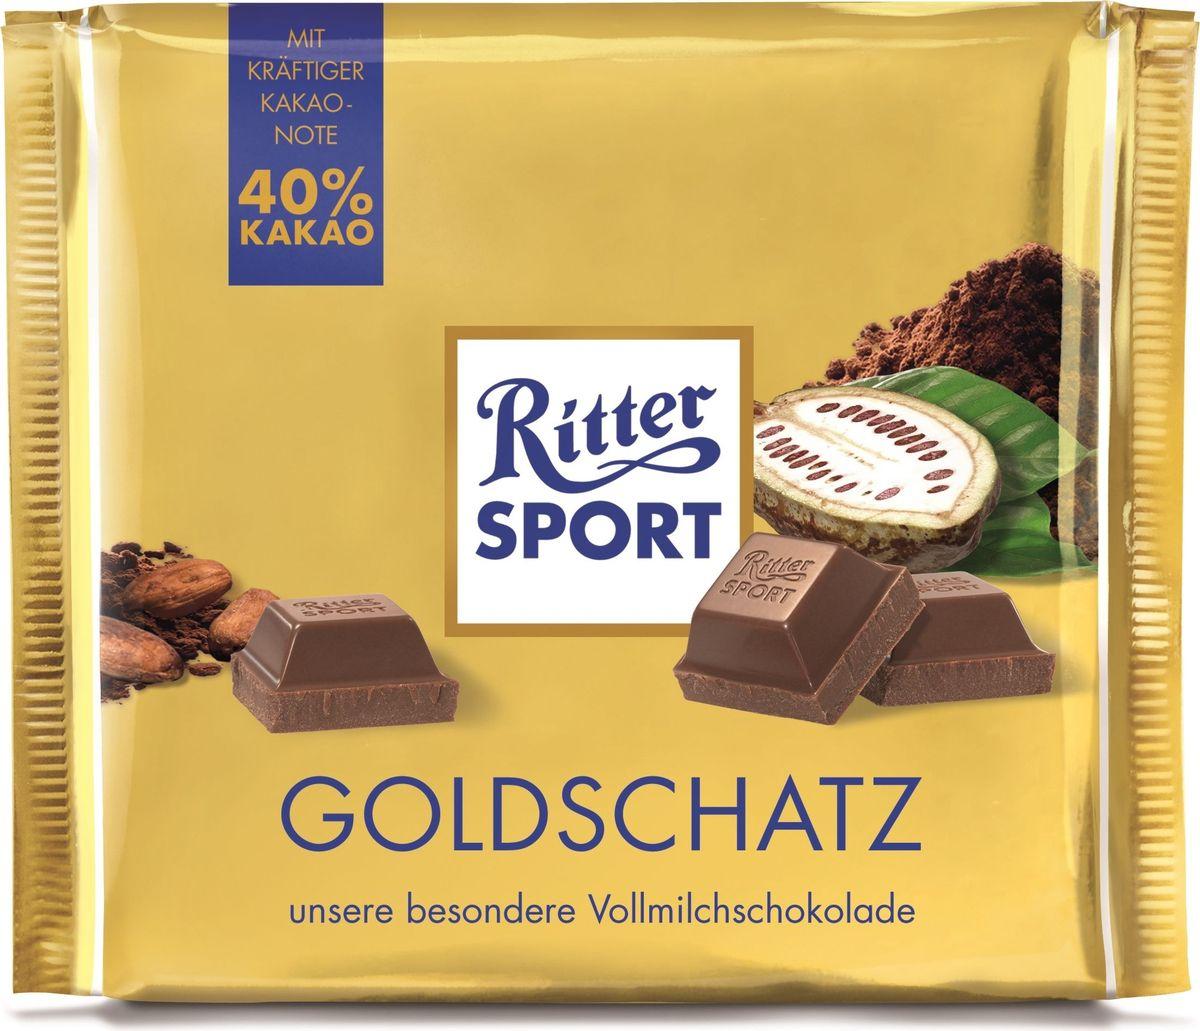 Ritter Sport Goldschatz, 250 г ritter sport мята шоколад темный с мятной начинкой 100 г